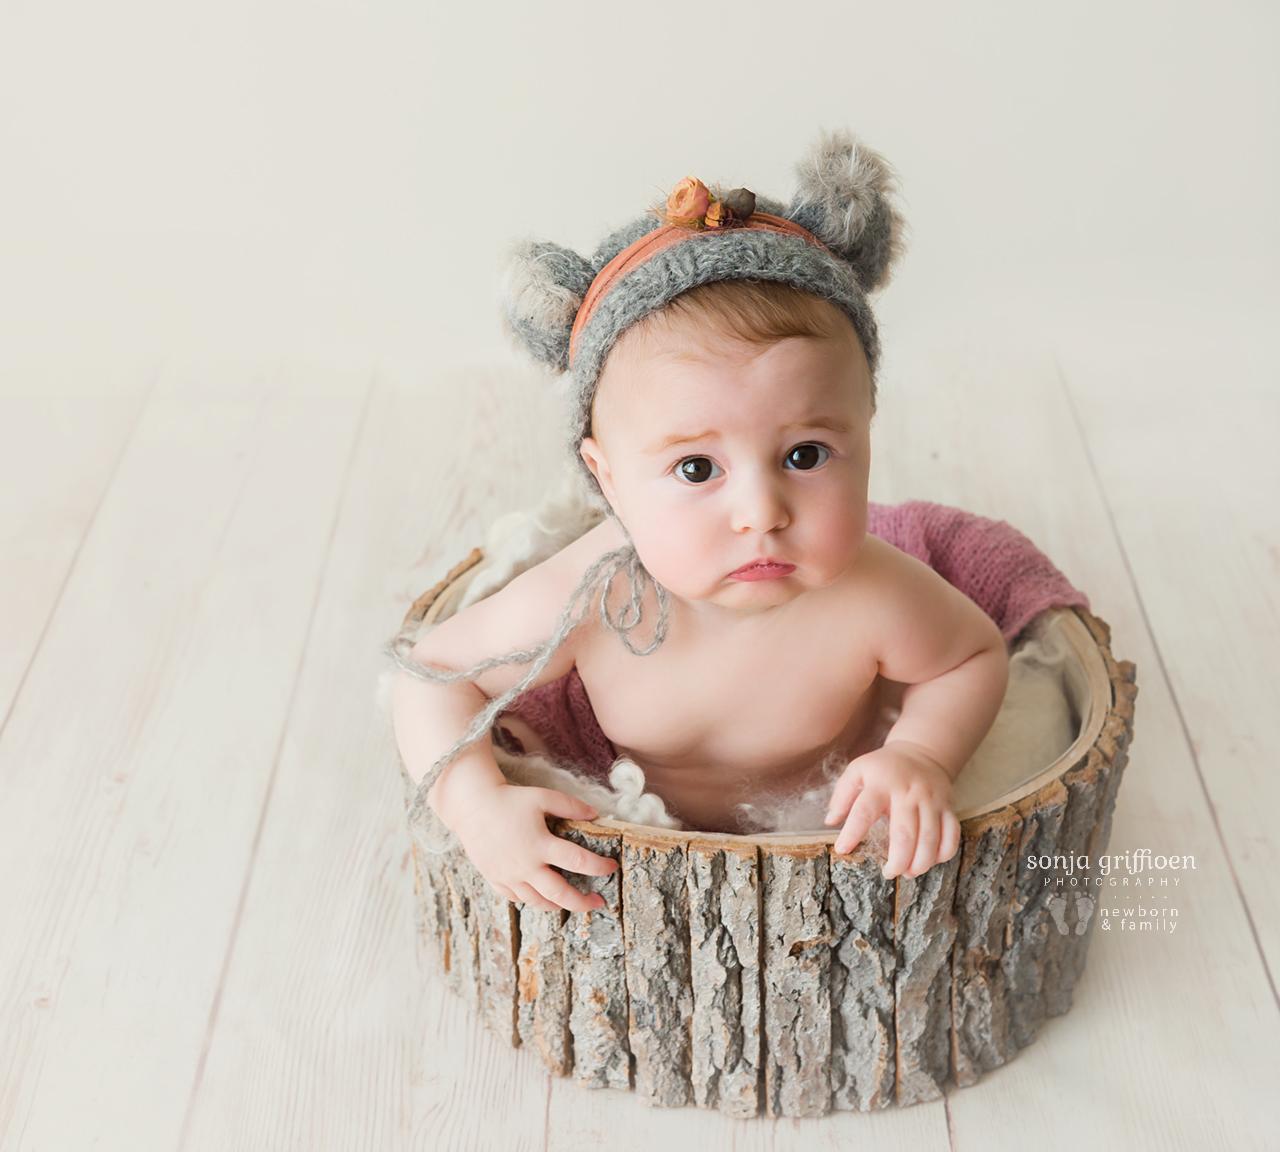 Everlyn-Milestone-Brisbane-Baby-Photography-Sonja-Griffioen-01.jpg